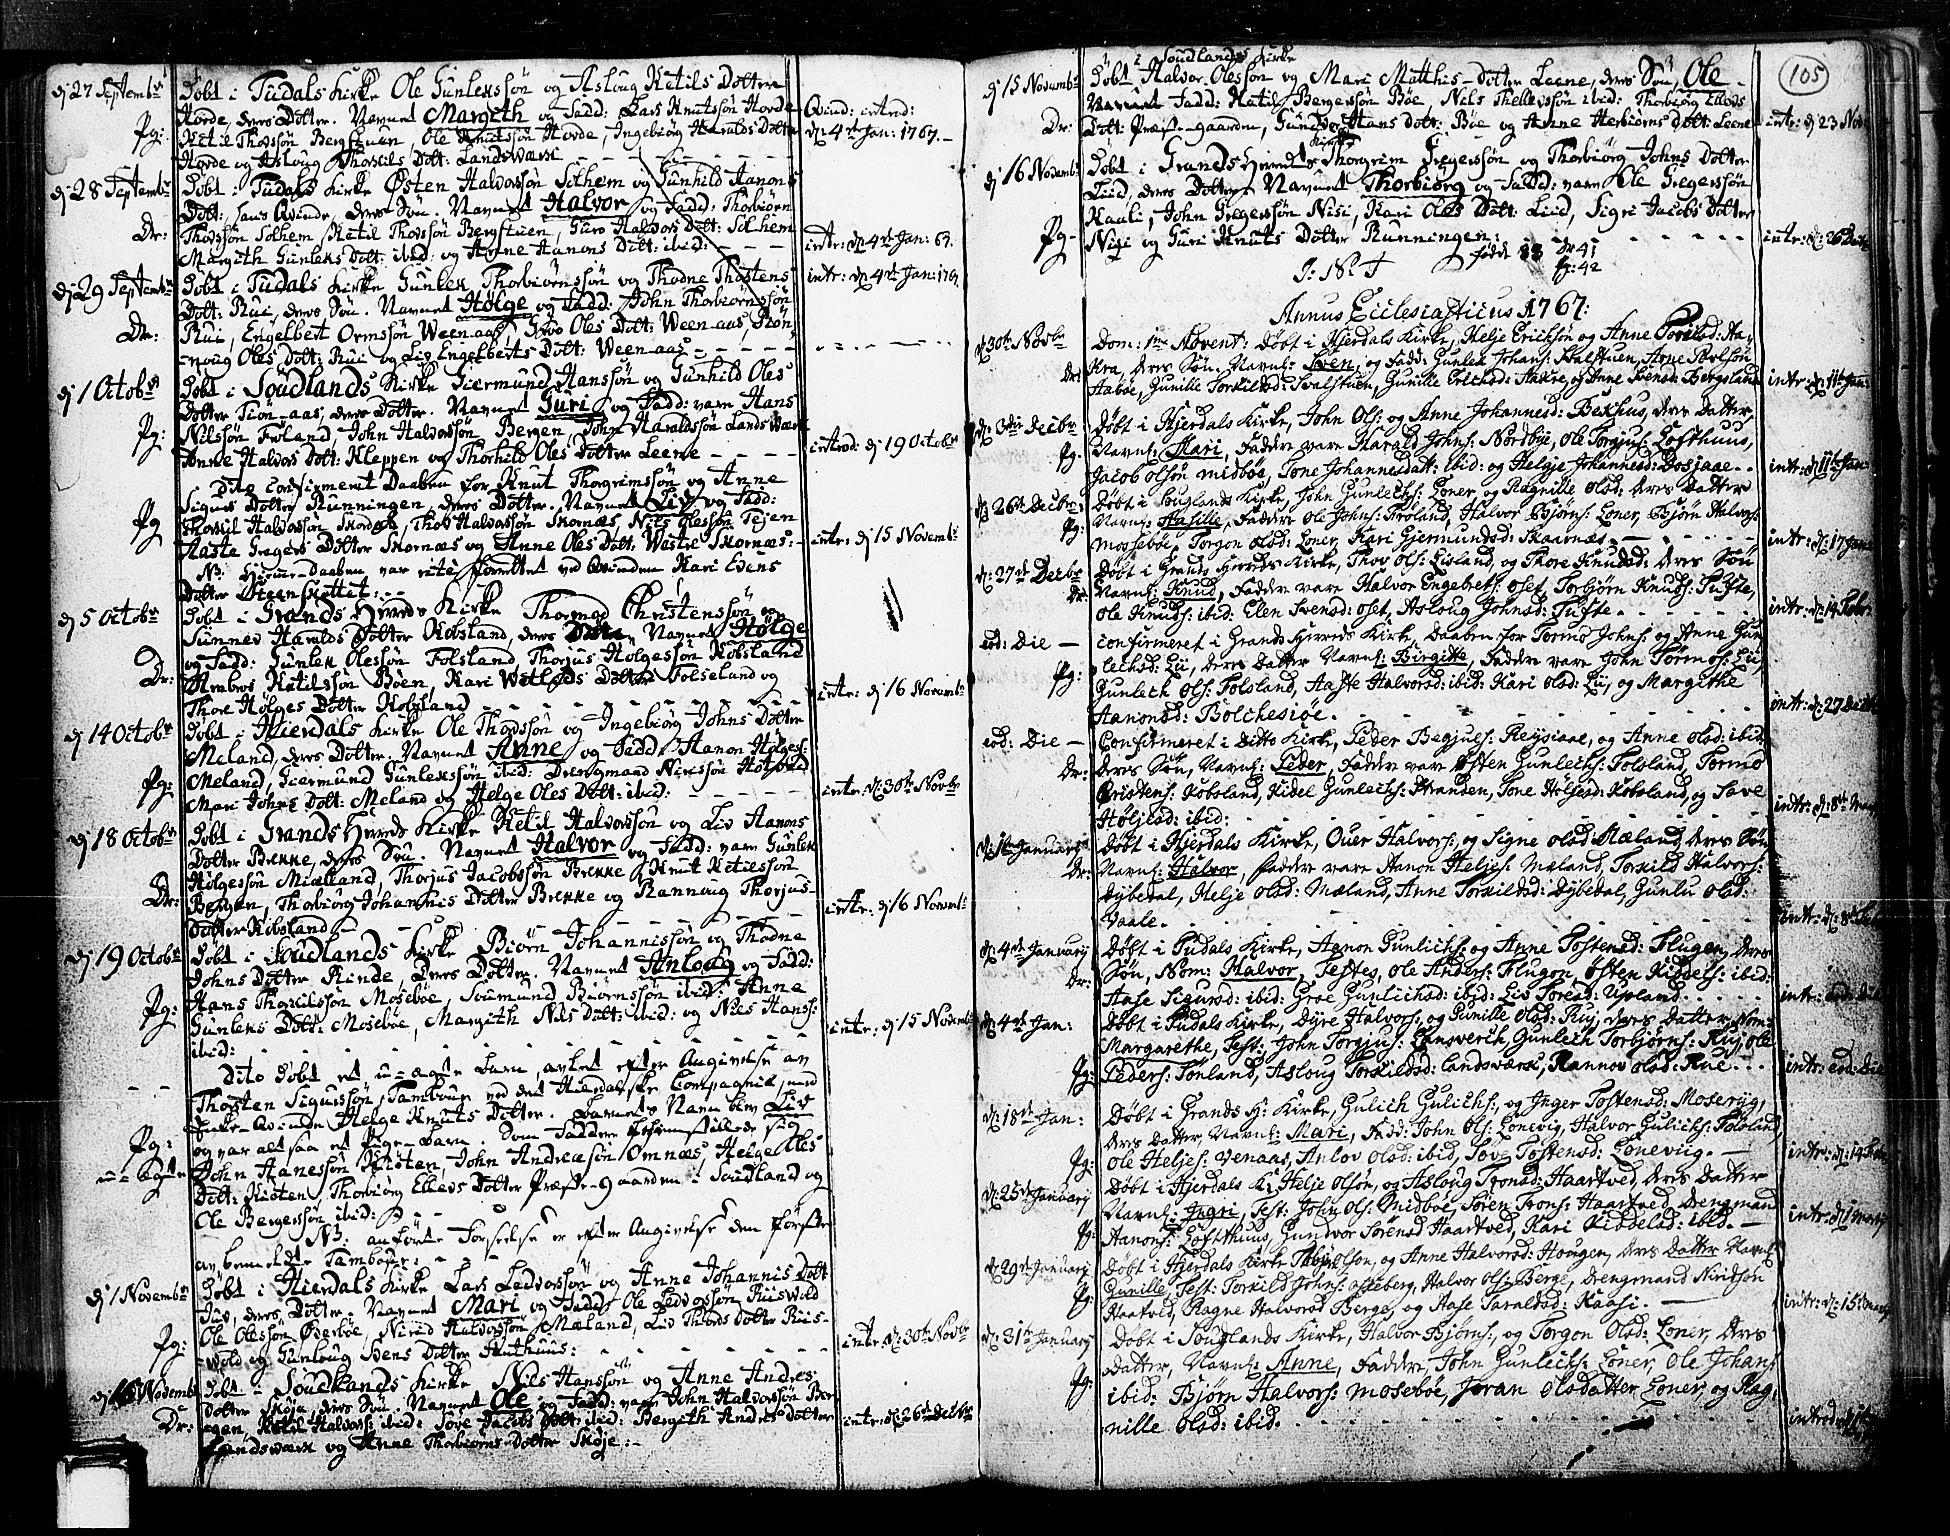 SAKO, Hjartdal kirkebøker, F/Fa/L0003: Ministerialbok nr. I 3, 1727-1775, s. 105